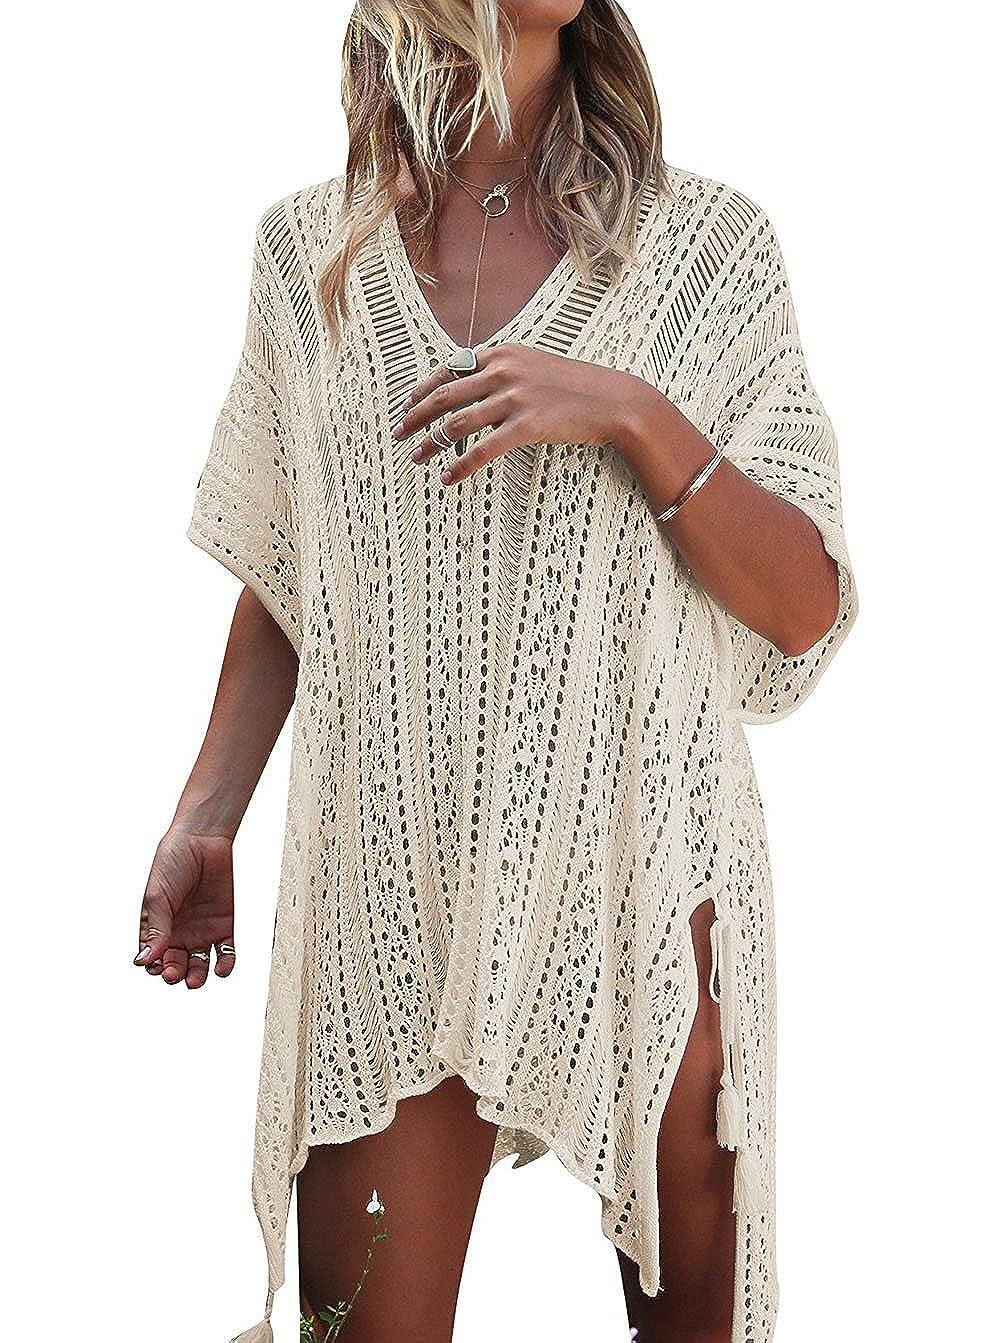 929e89dc23 HARHAY Women's Summer Swimsuit Bikini Beach Swimwear Cover up Beige at  Amazon Women's Clothing store: